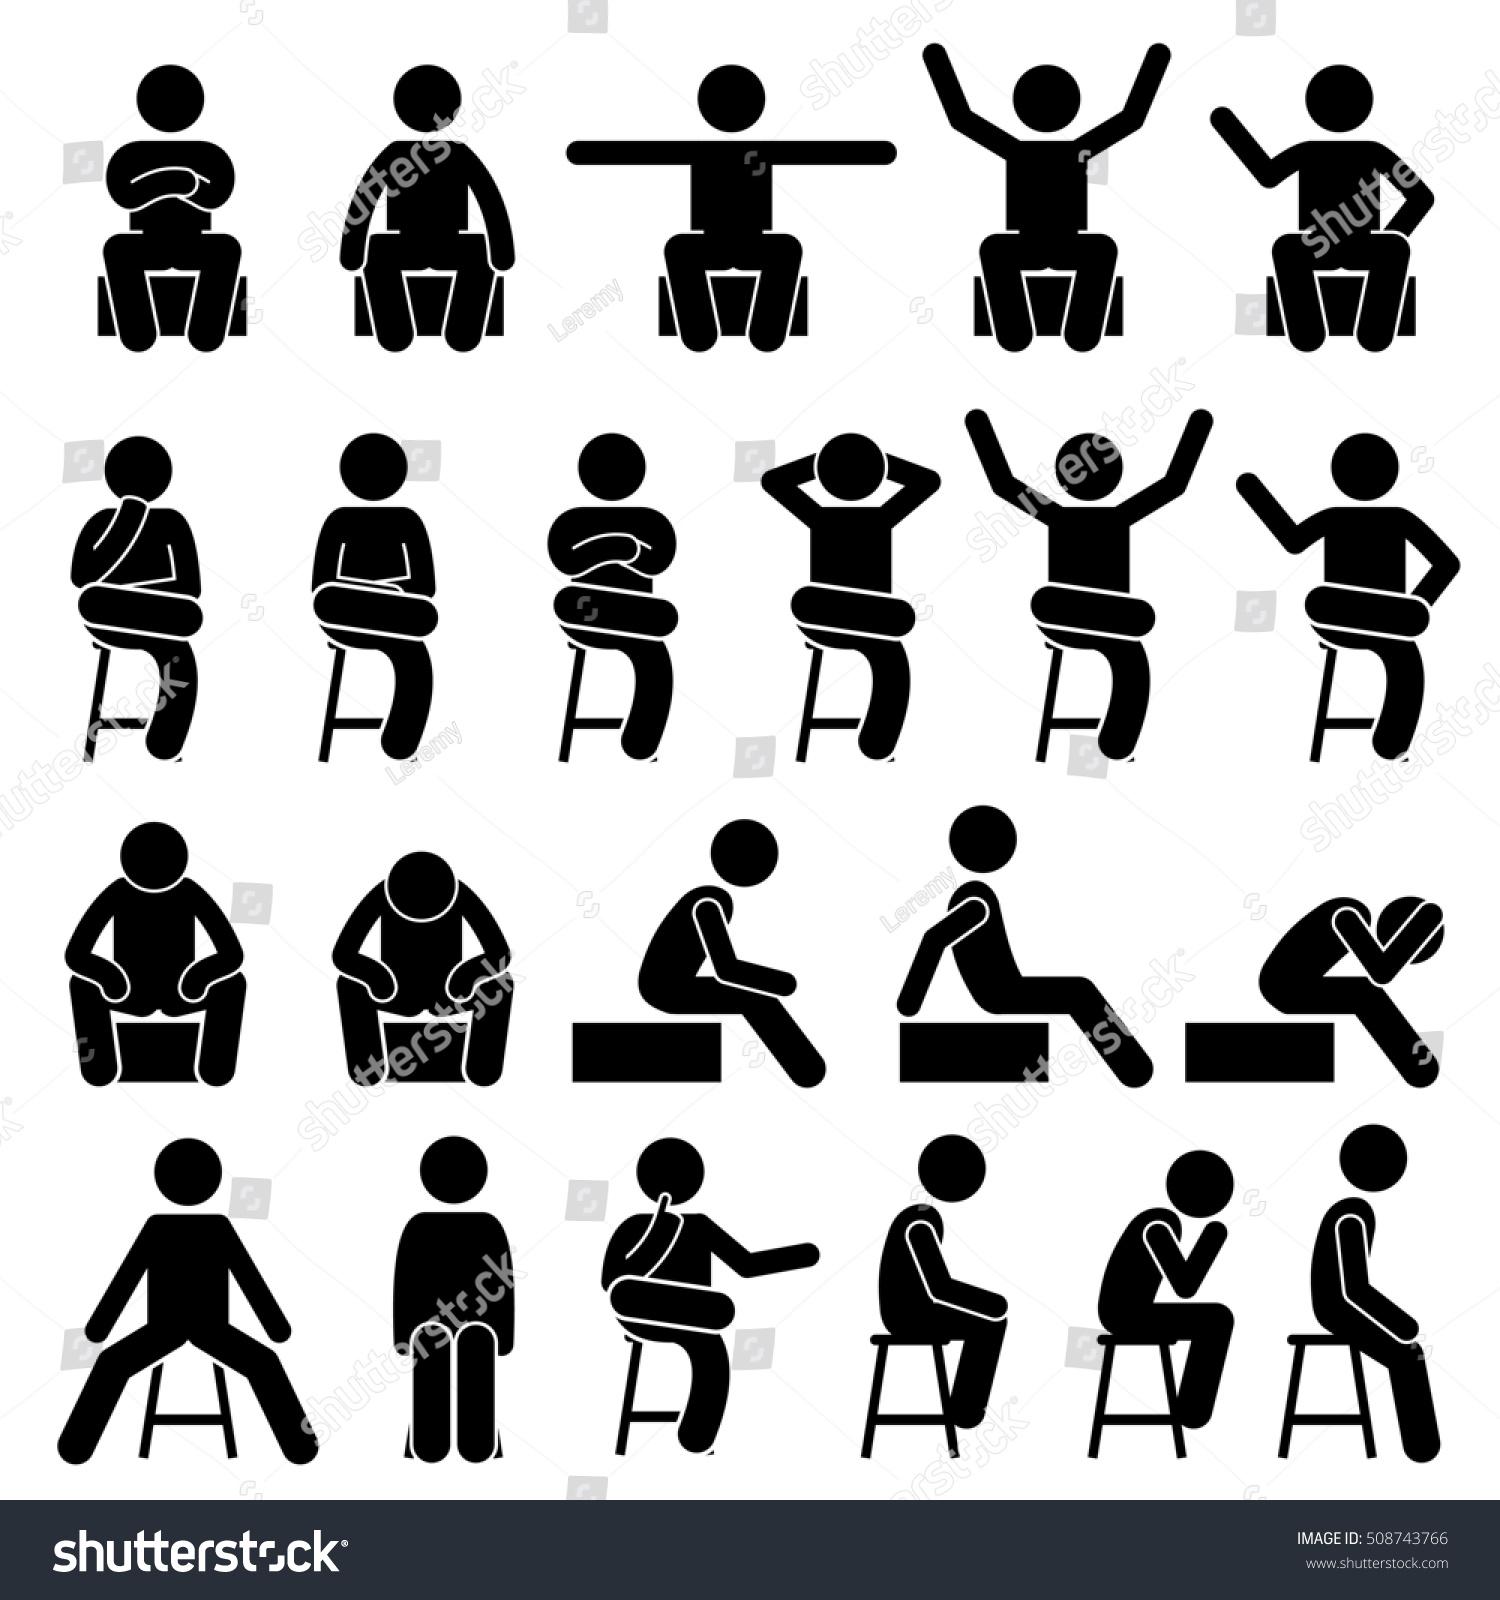 sitting on chair poses postures human stock illustration. Black Bedroom Furniture Sets. Home Design Ideas